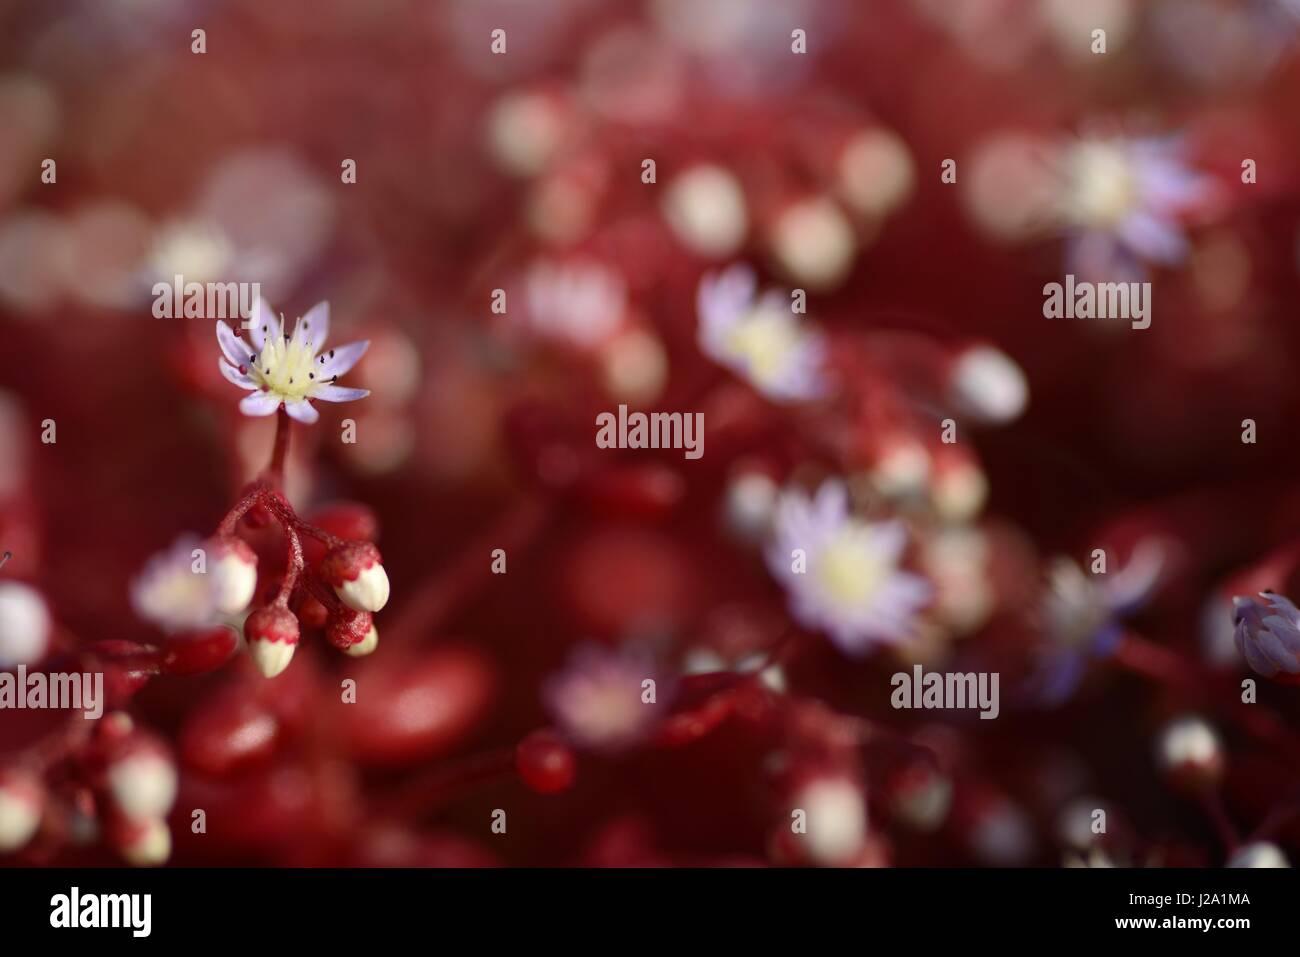 Flowering Sedum caeruleum with deep red leaves and licht blue flowers - Stock Image